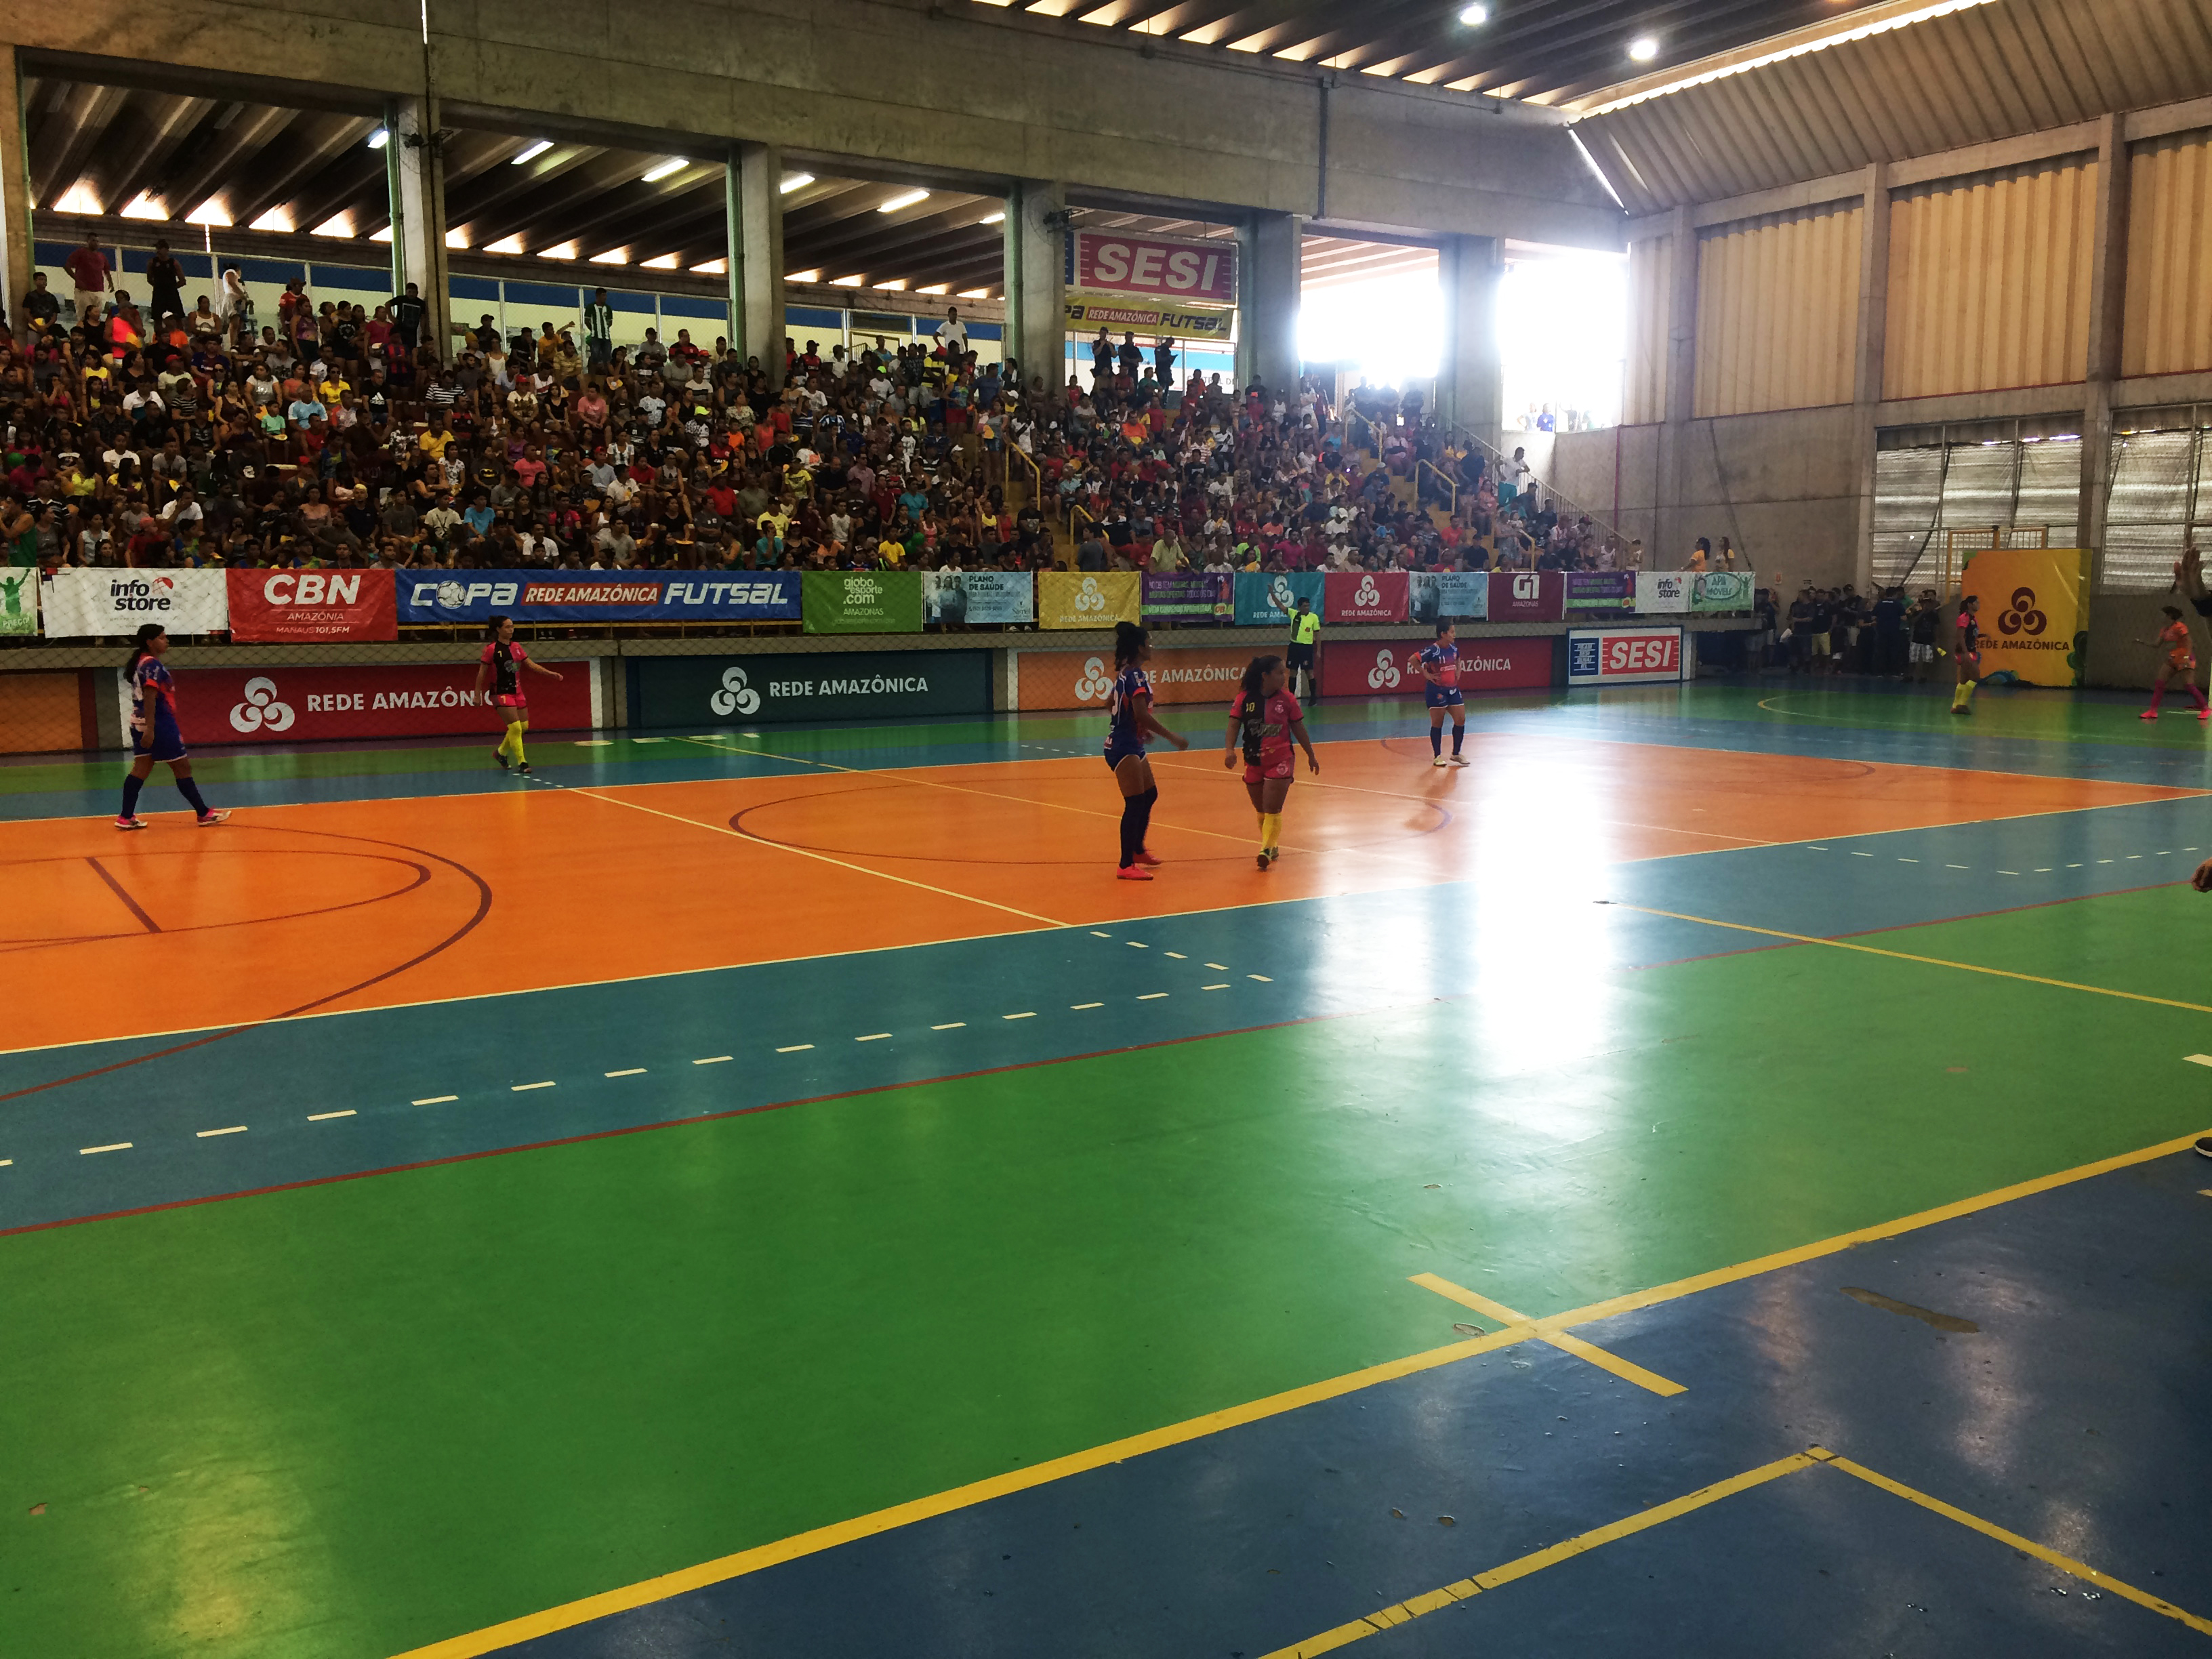 Time feminino de futsal é vice-campeão da Copa Rede Amazônica de Futsal 2018